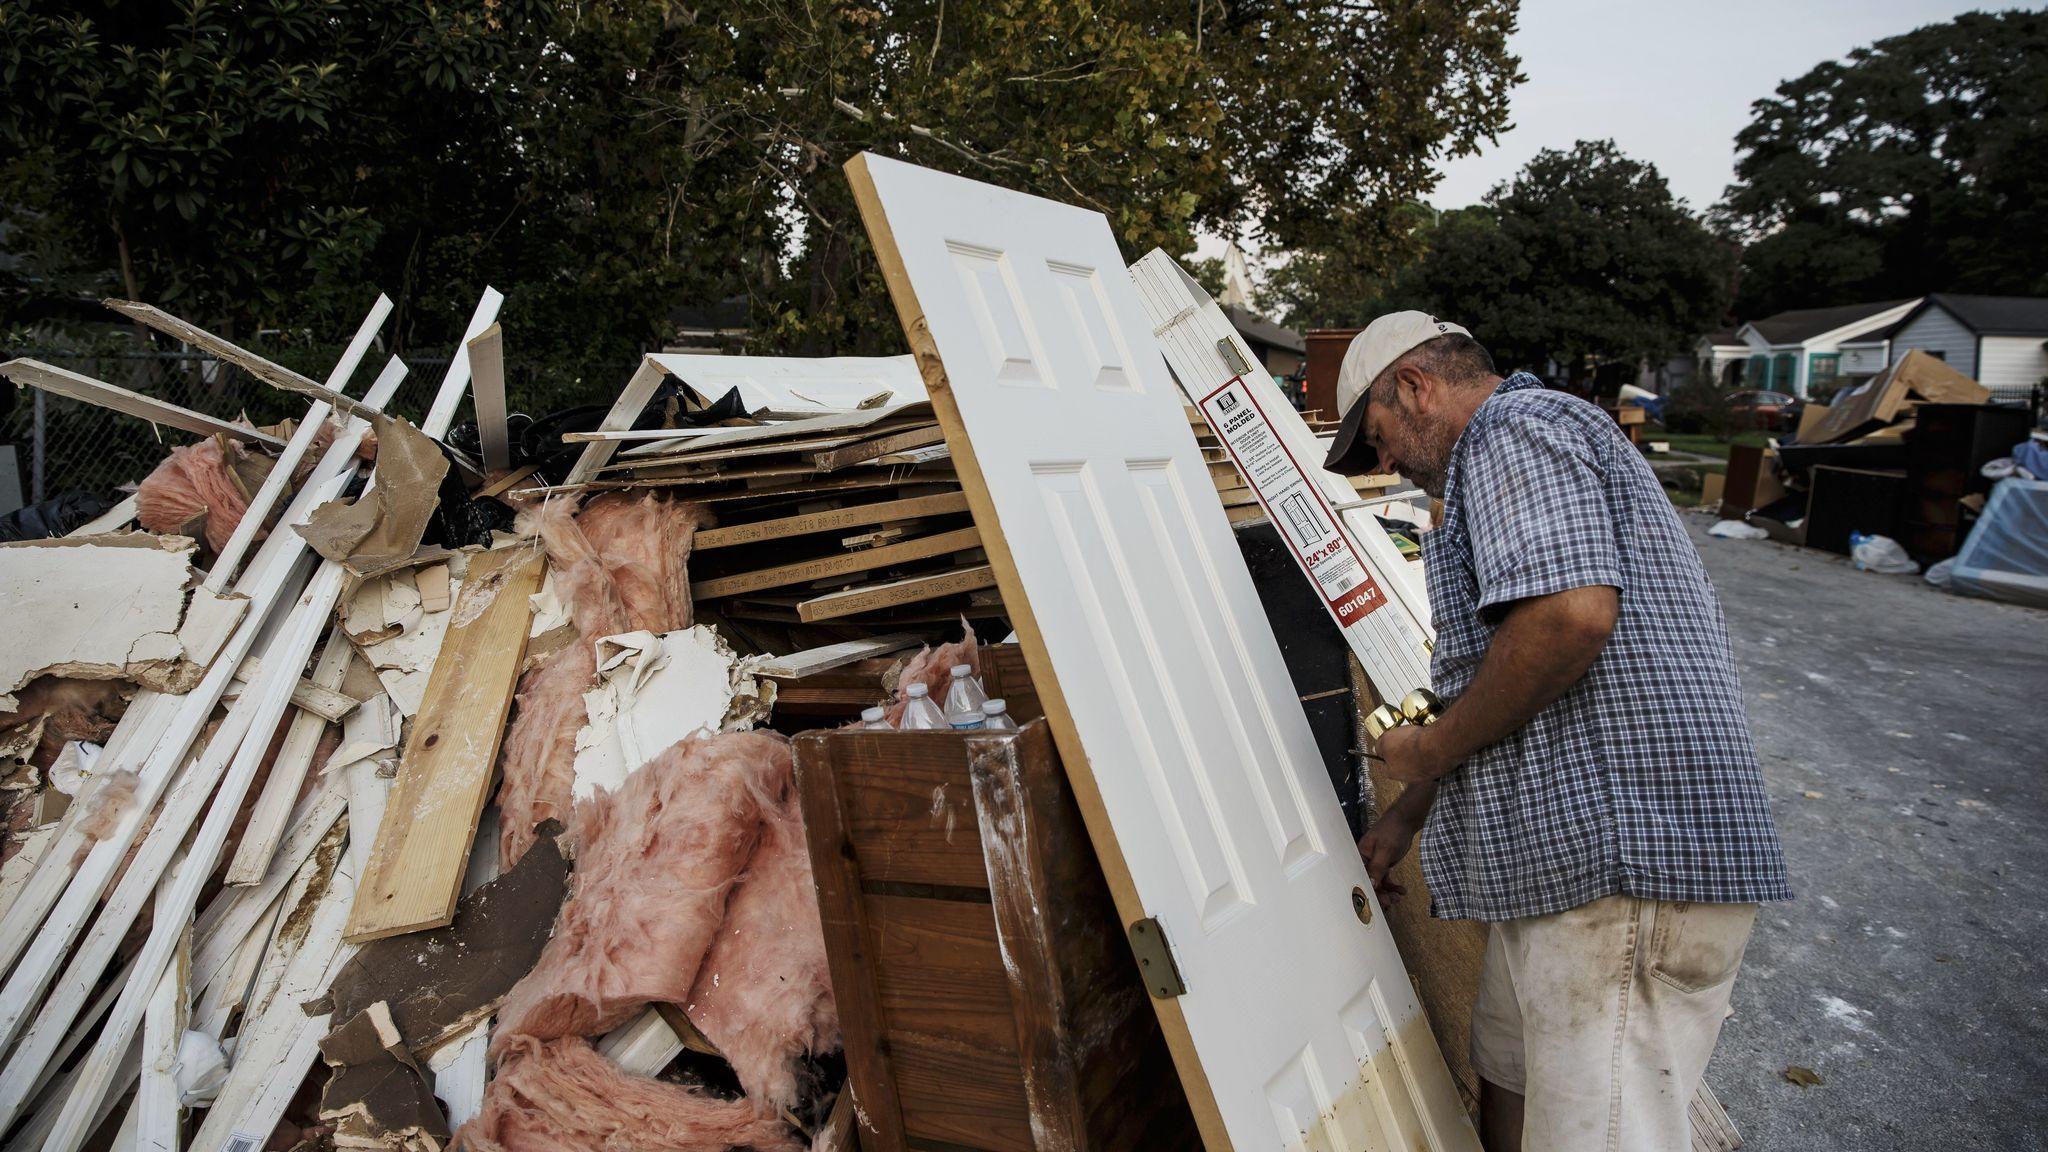 Lino Saldana is salvaging parts like doorknobs to save